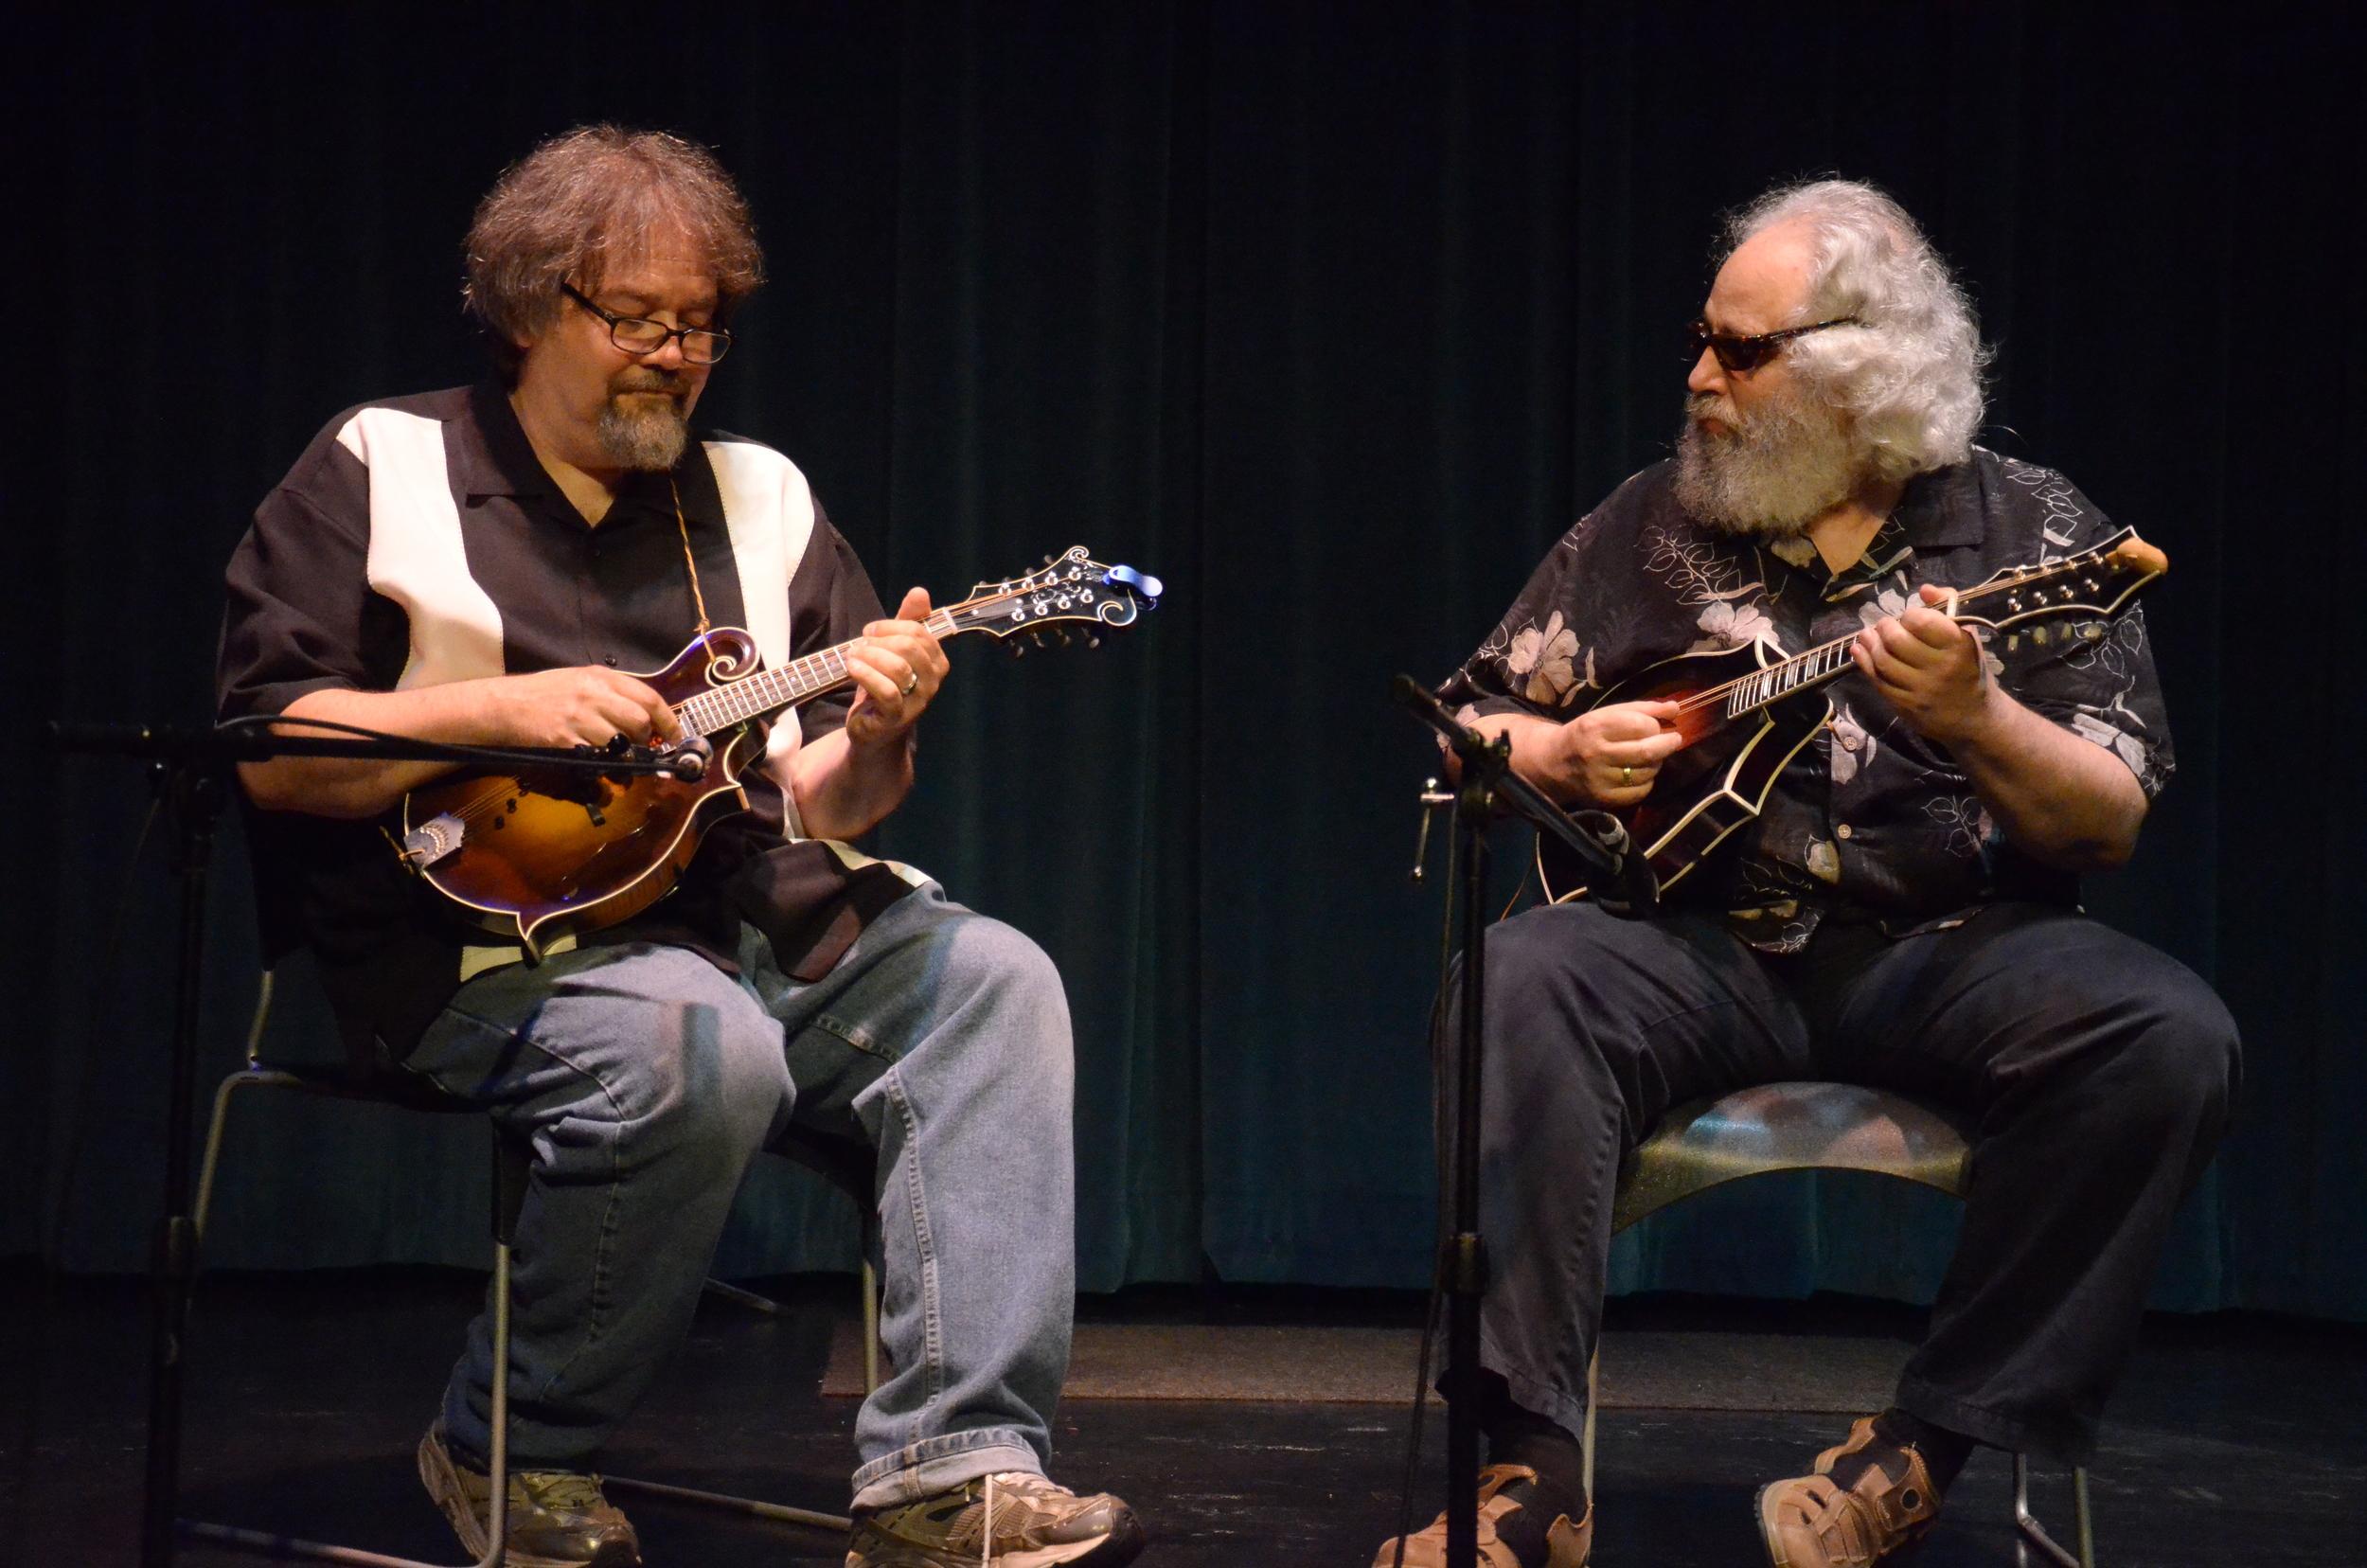 don Julin and david grisman, photo by Maria camillo